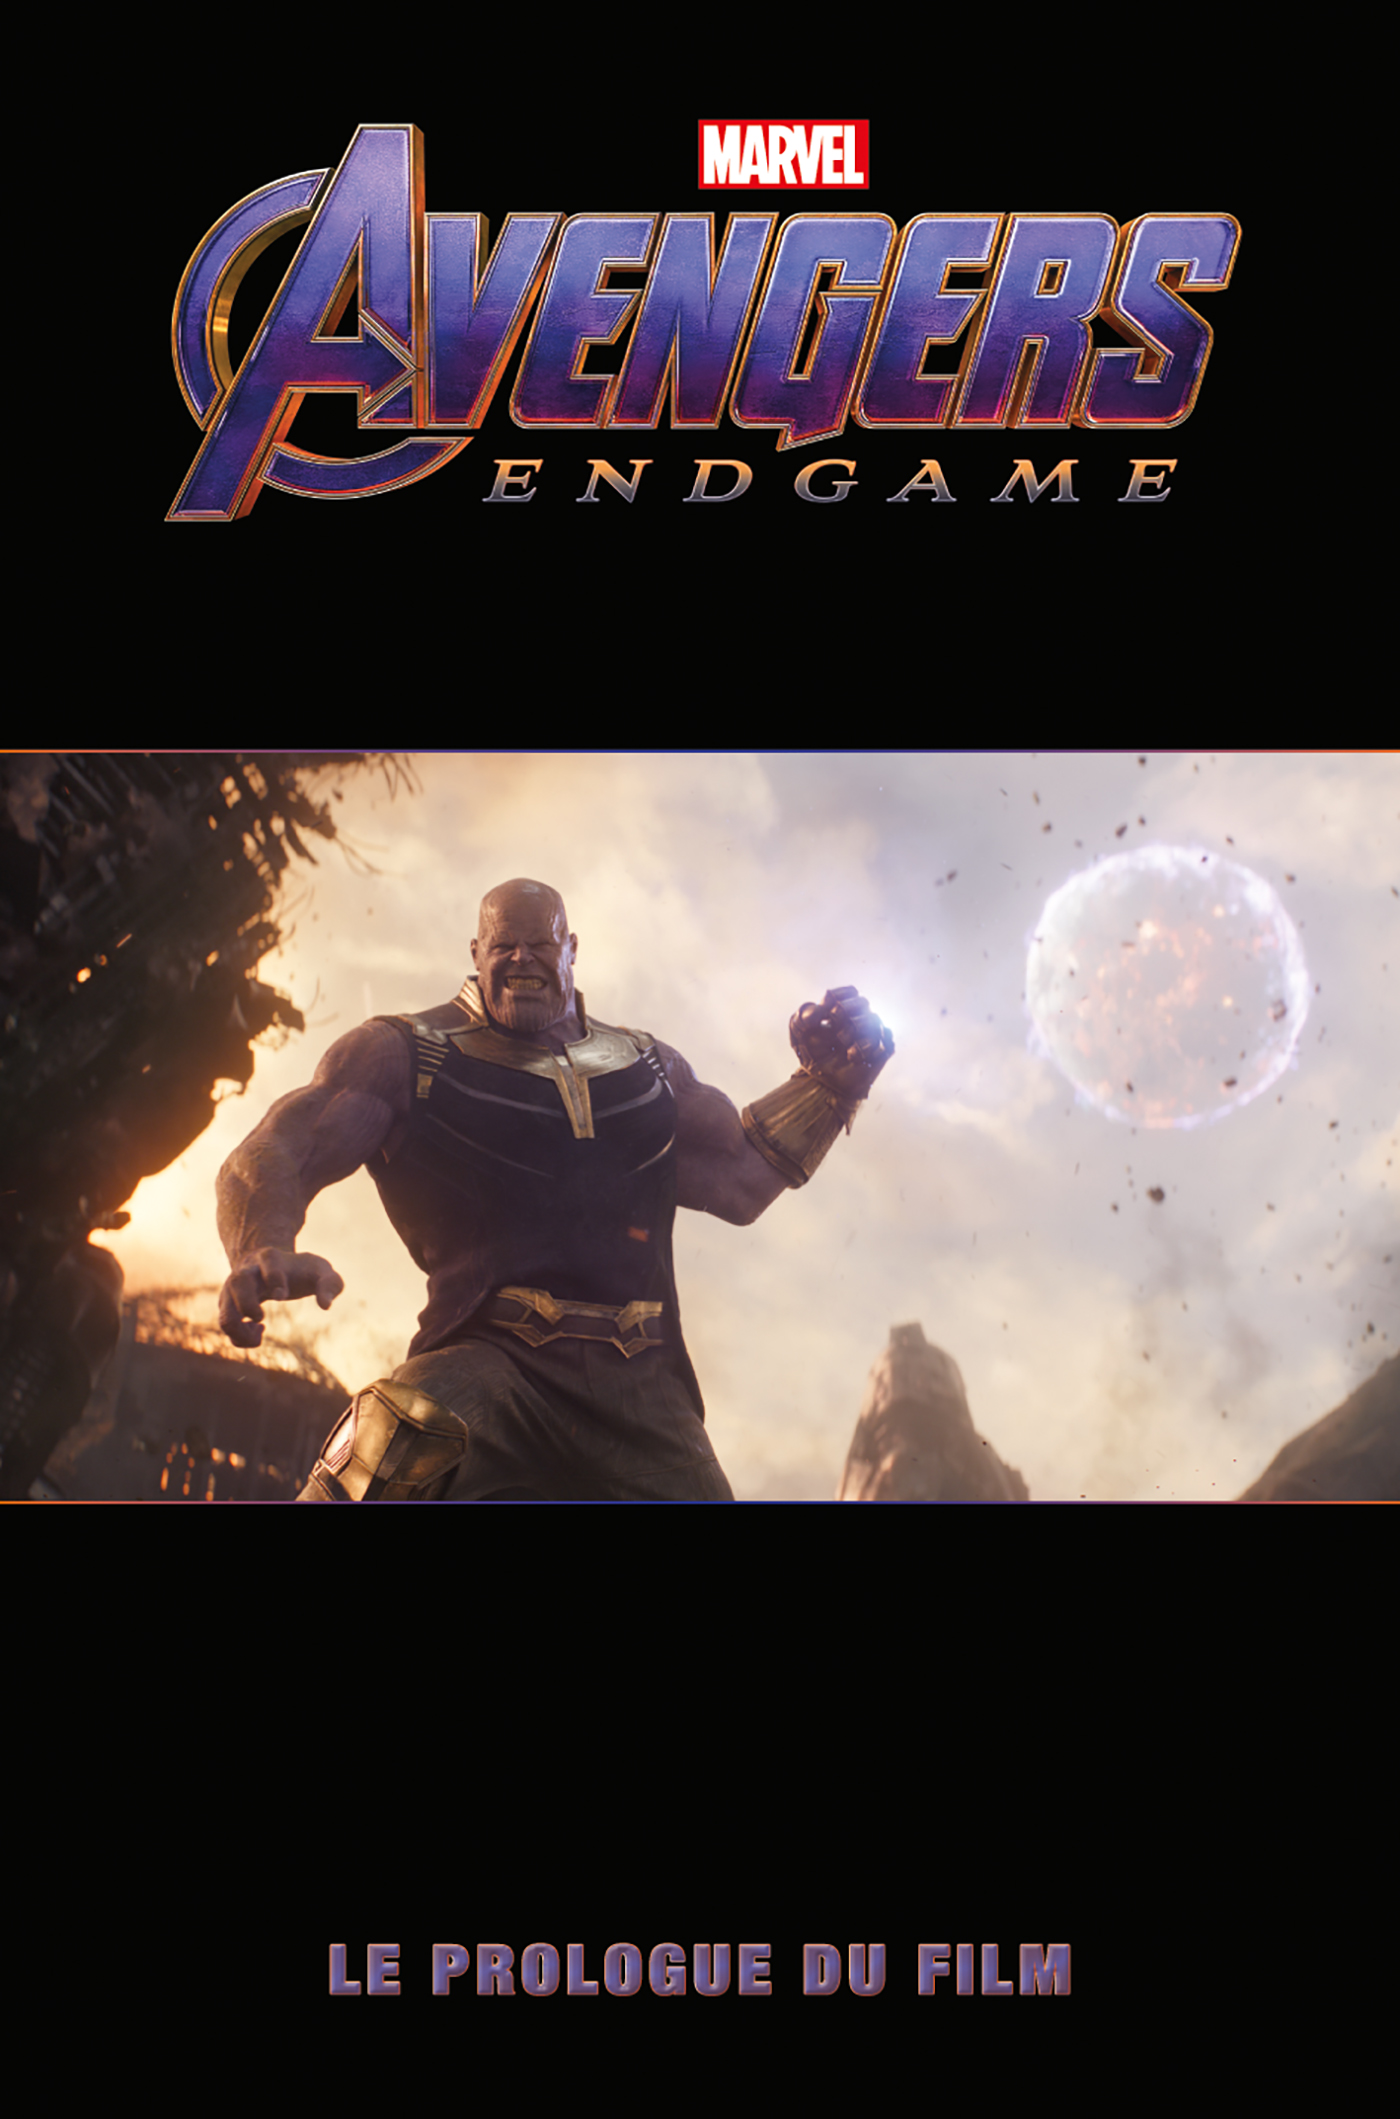 Avengers - Endgame - Le Prologue du Film 1